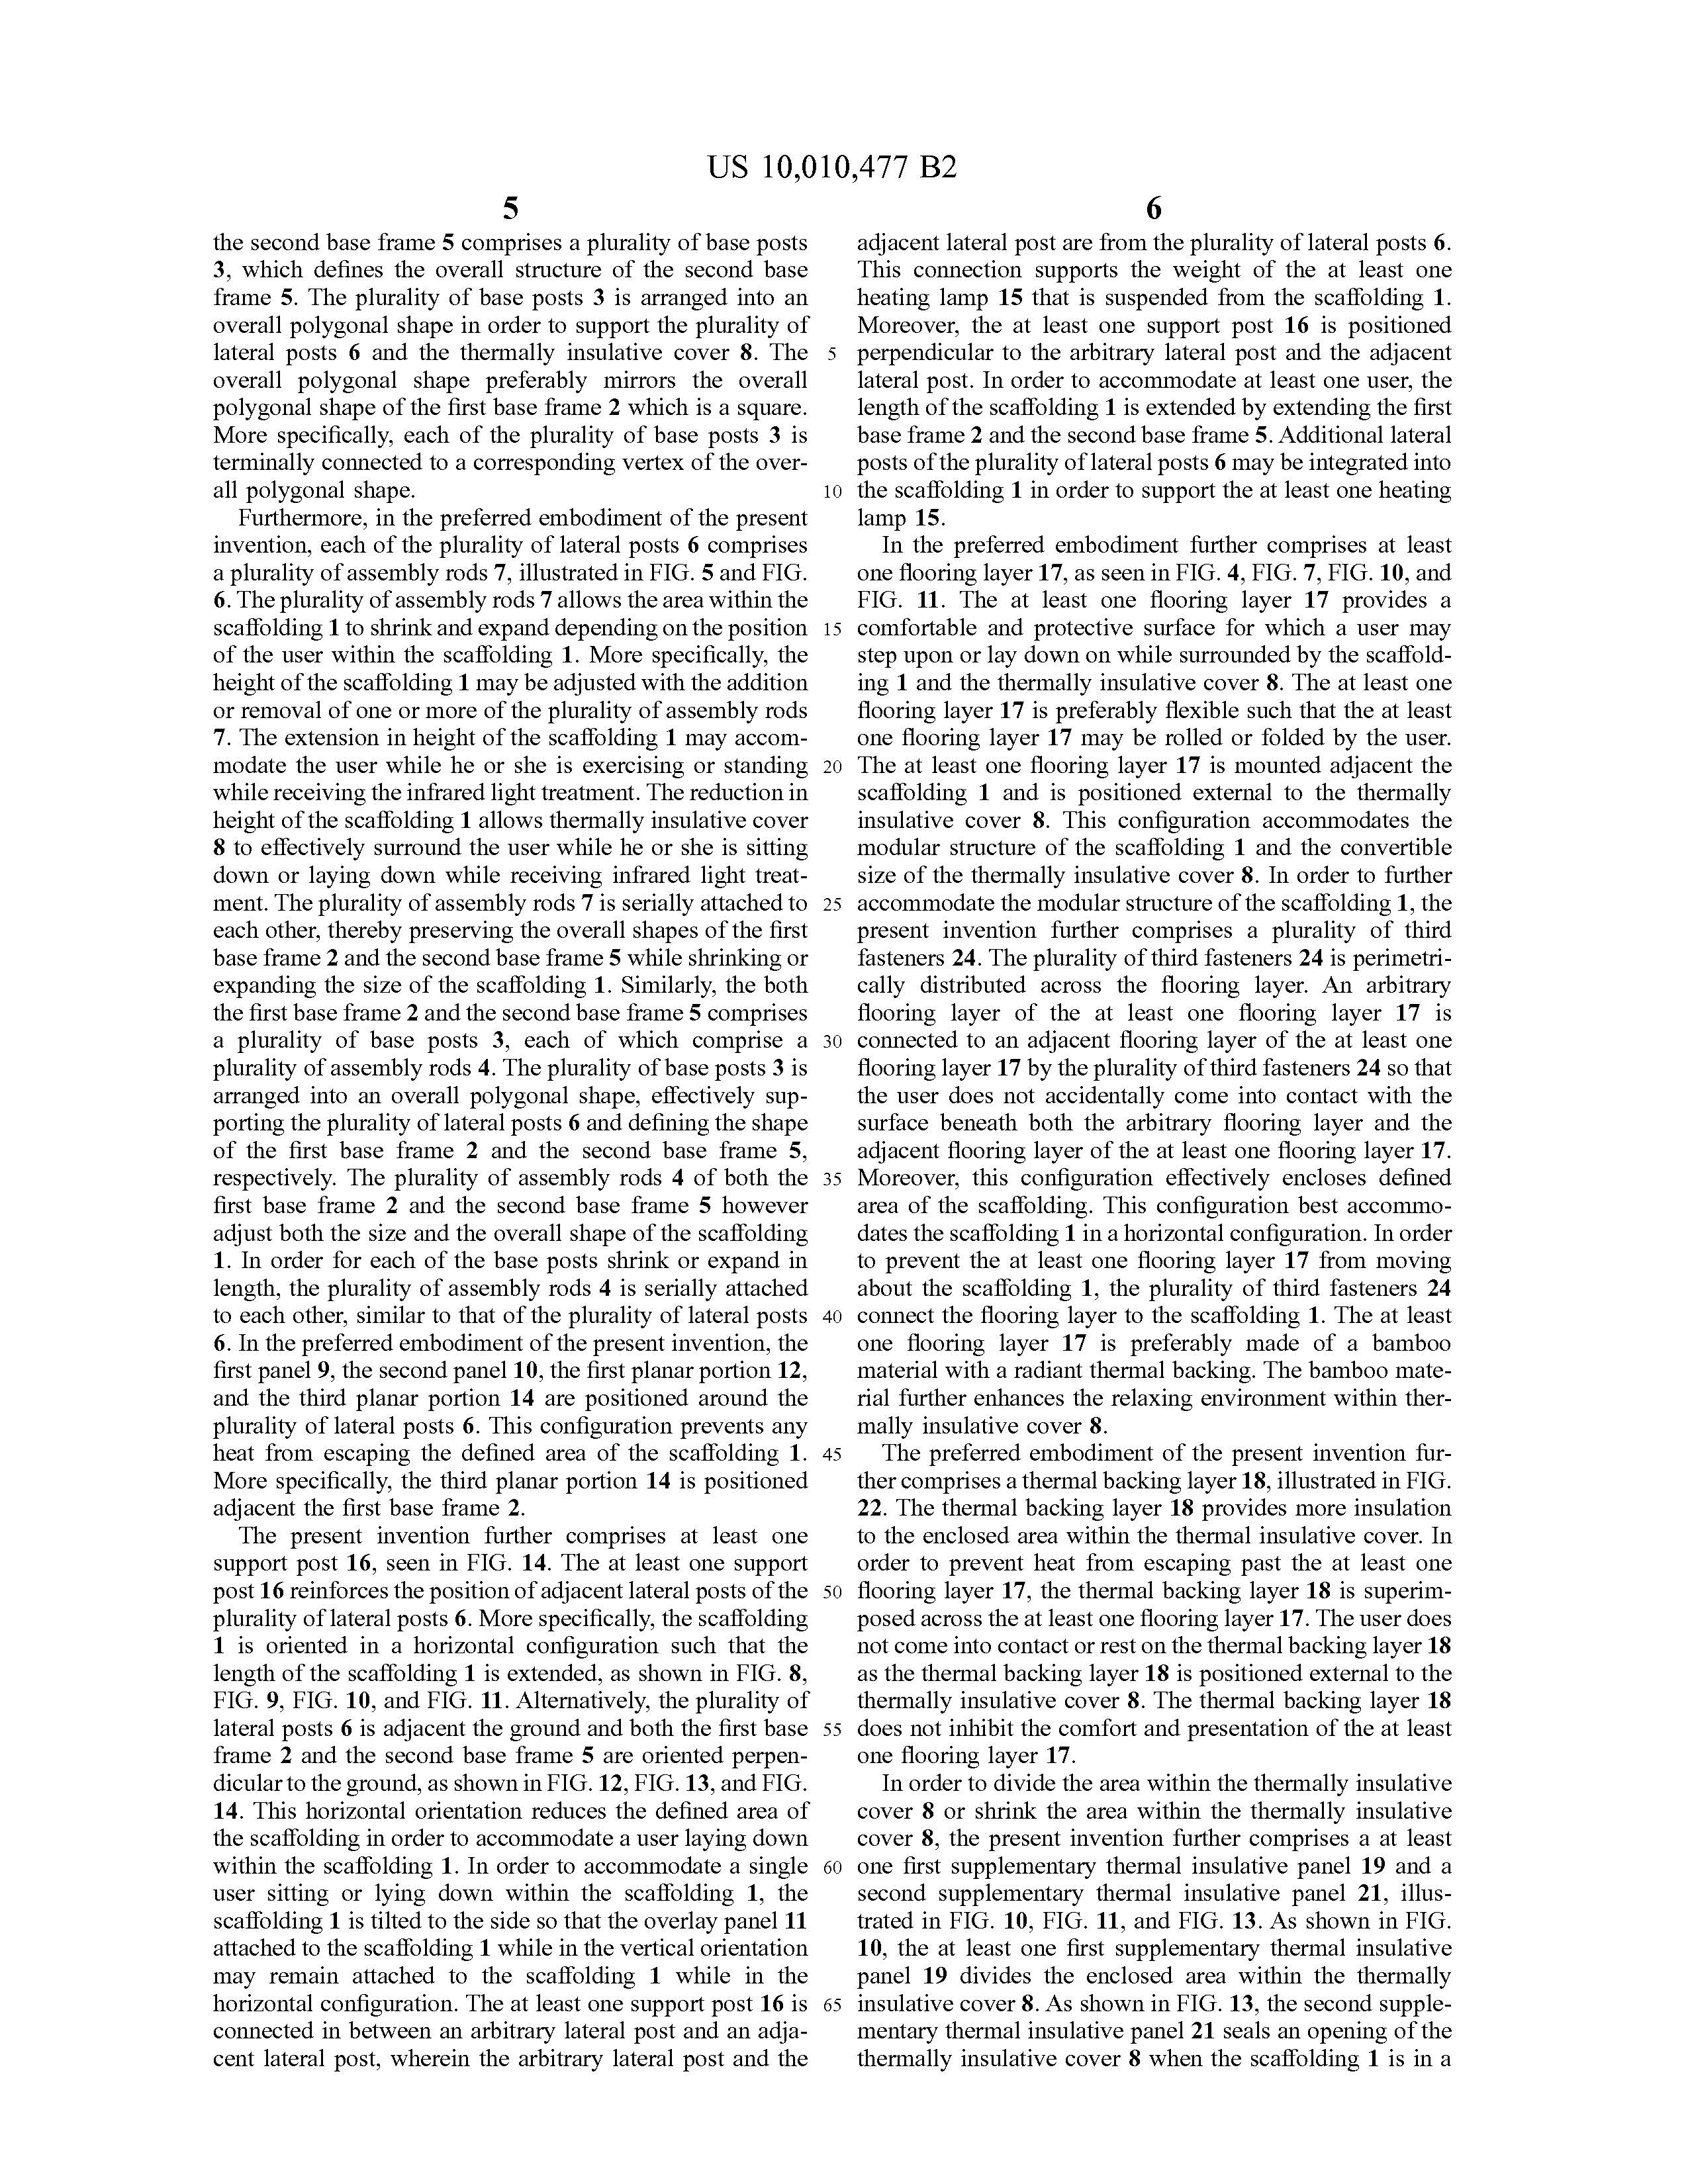 Sauna Tent Patent Page 27